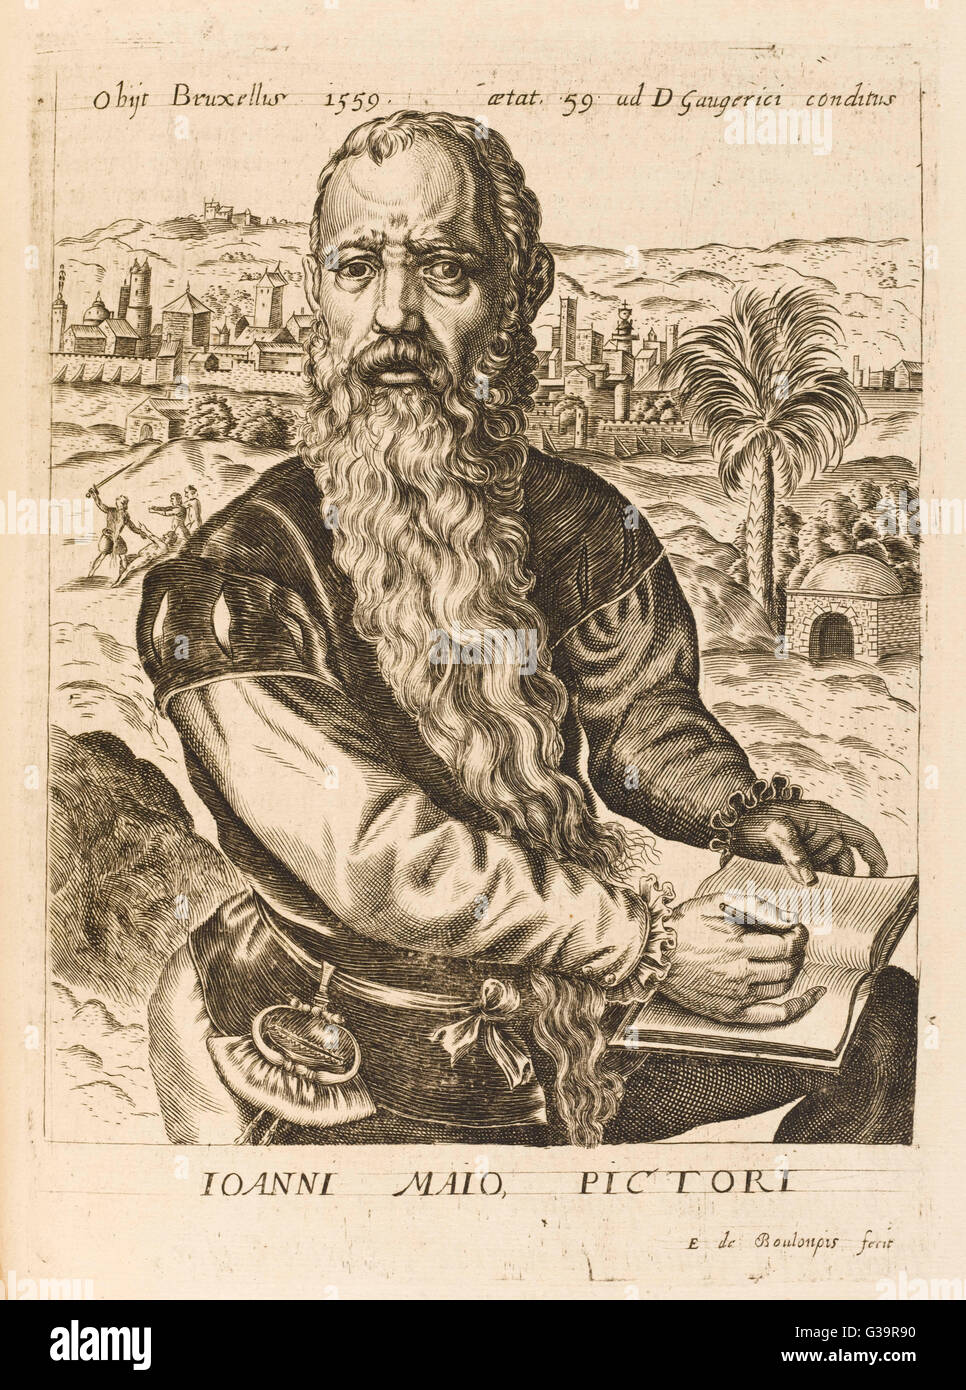 JAN CORNELIS VERMEIJEN  Dutch artist        Date: 1500 - 1559 - Stock Image